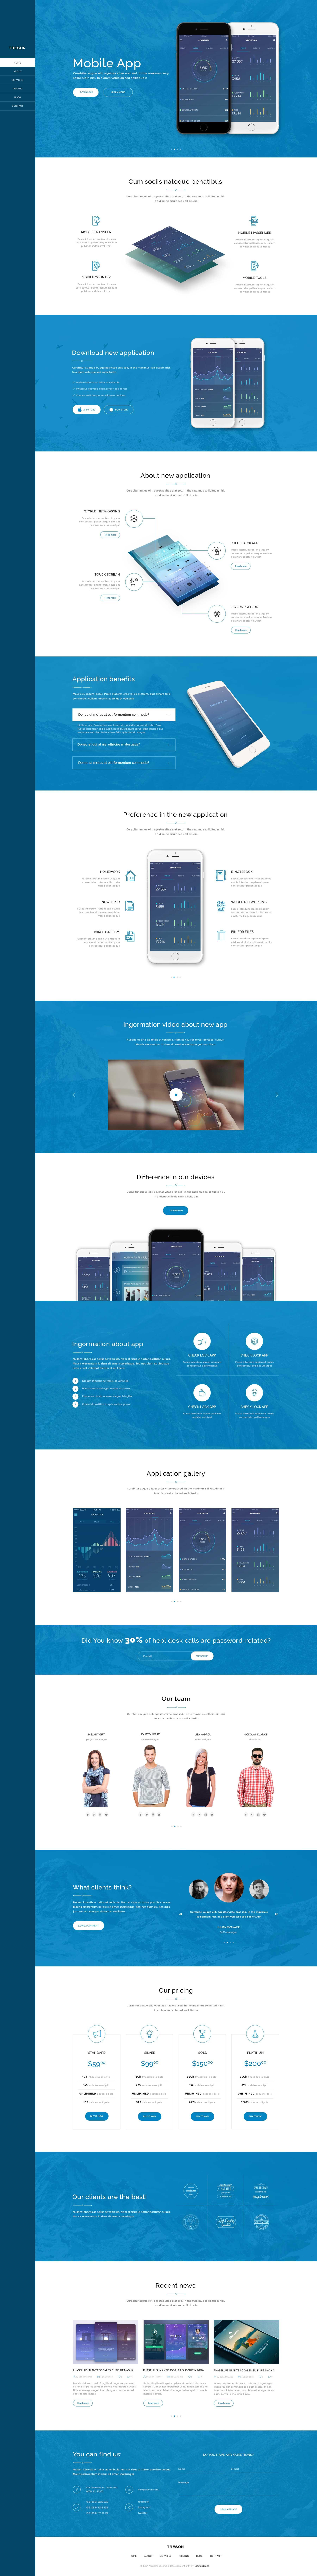 Treson - One Page WordPress Theme - 4